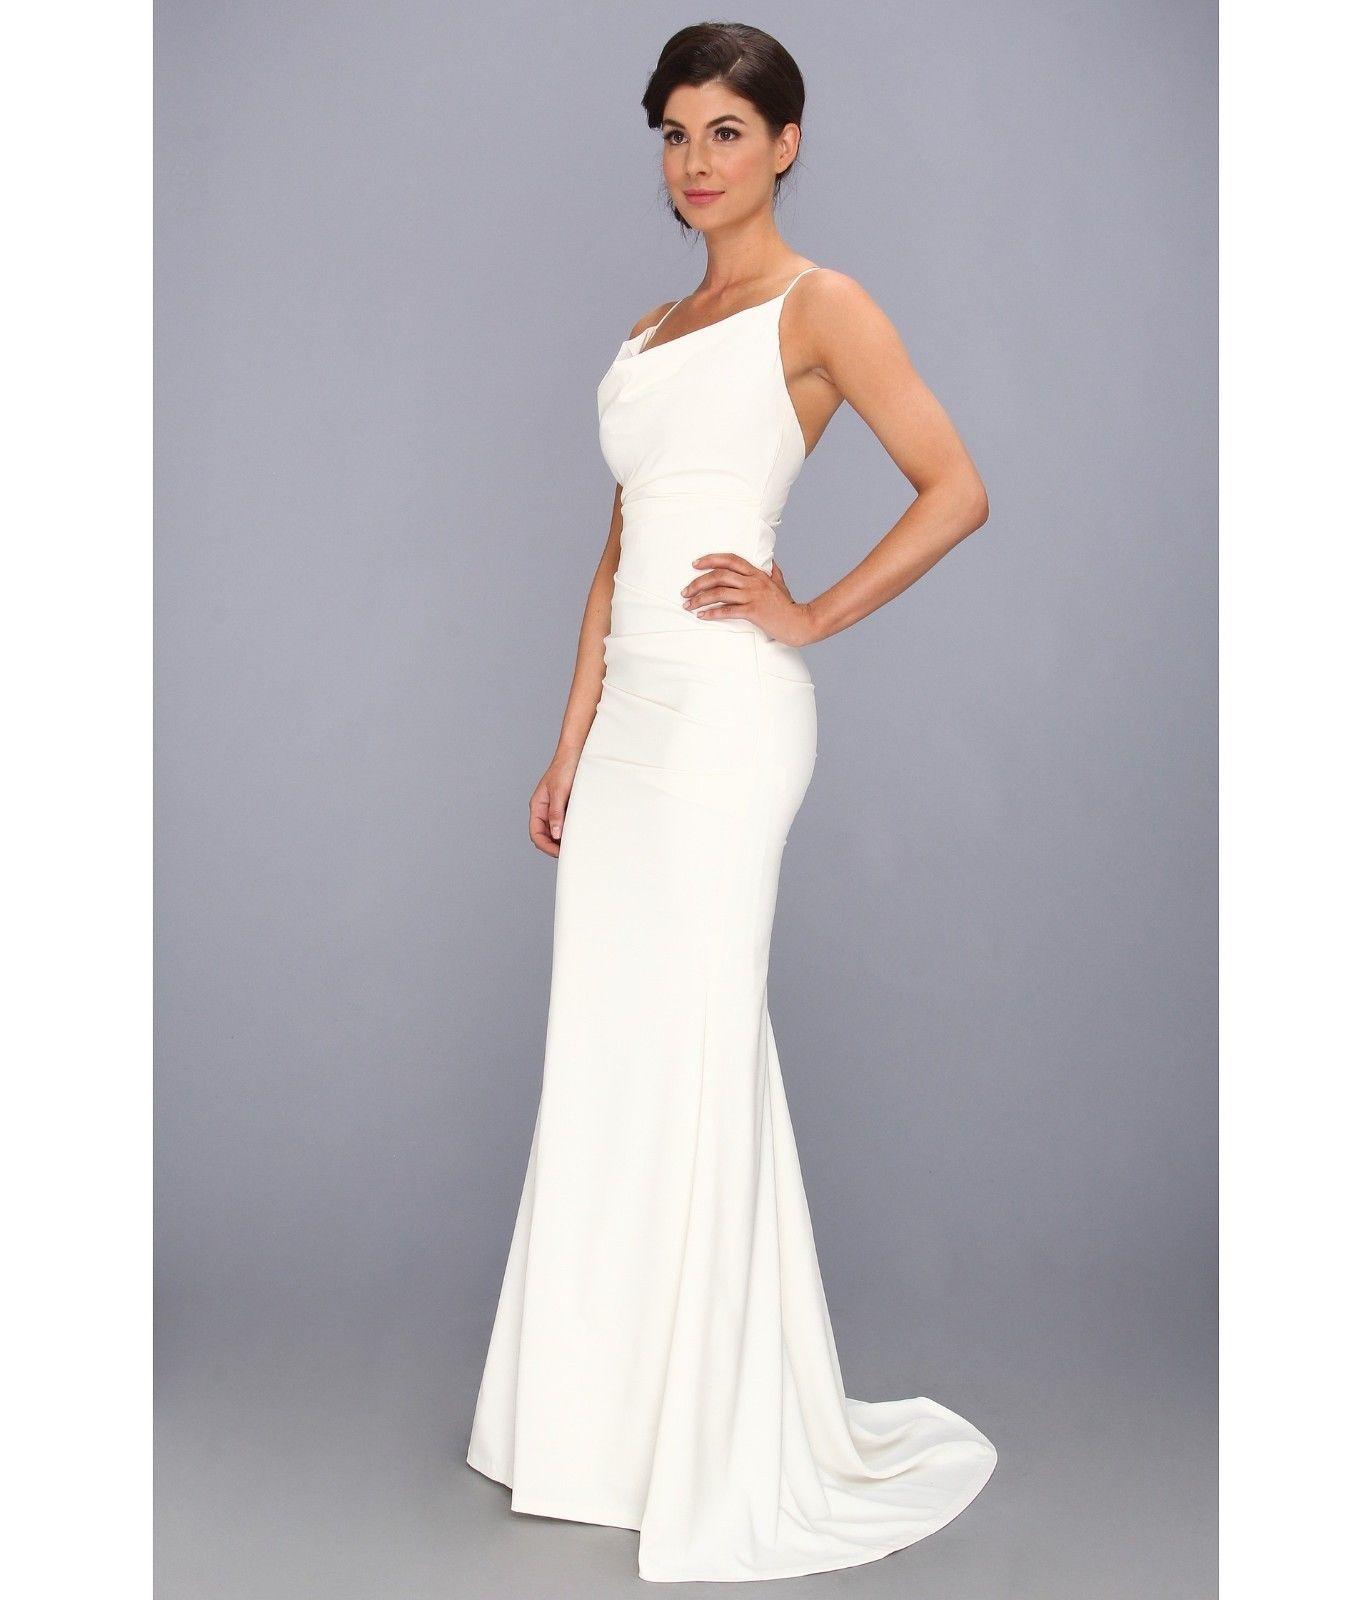 Nicole Miller Tara Cowl Women's Wedding Dress Bridal Gown Antique White Size 6